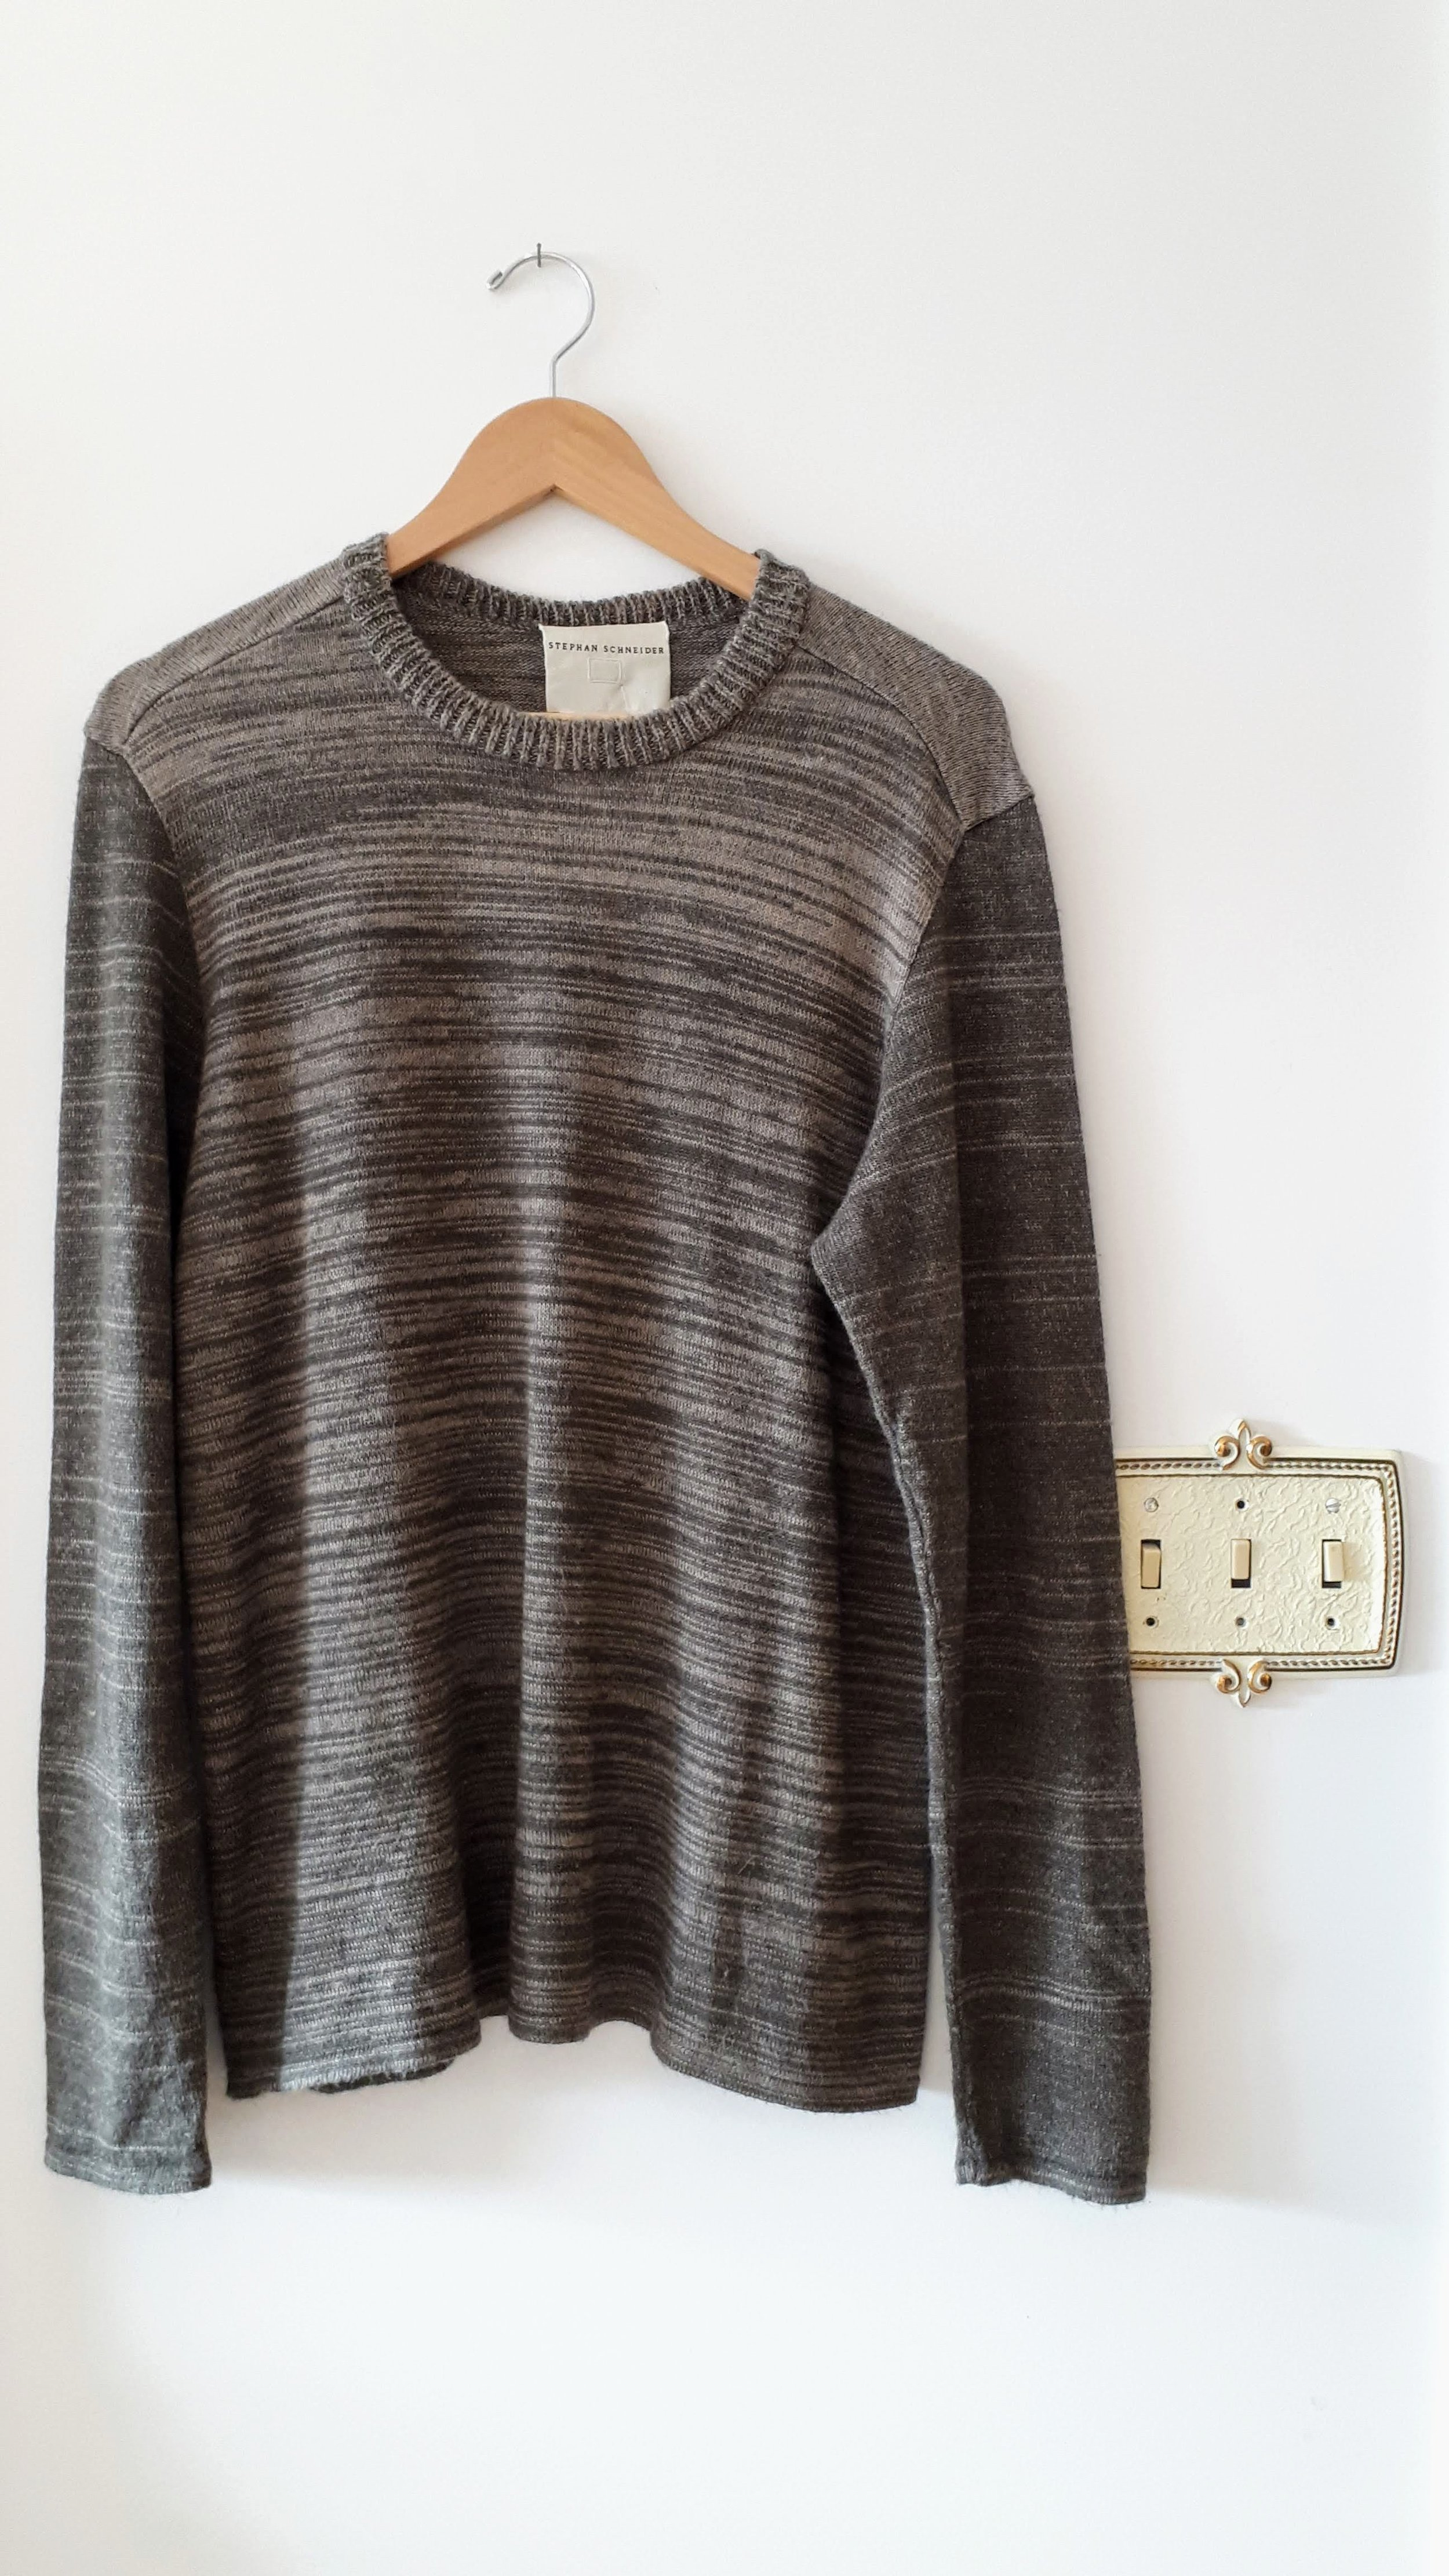 Mens Stephan Schneider sweater; Size M, $58